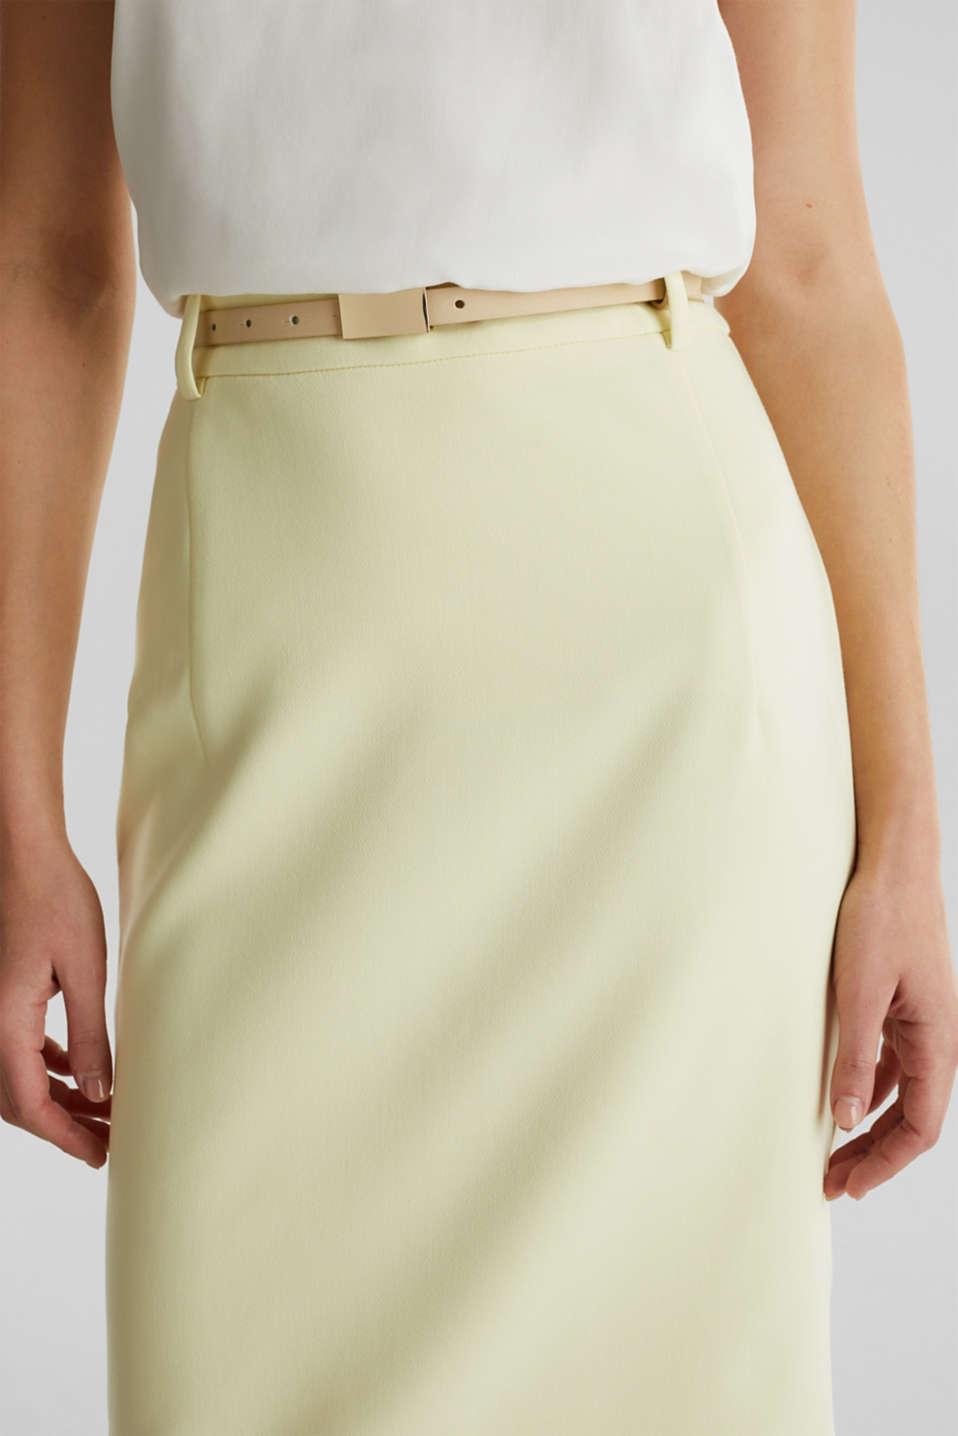 SUMMER BIZ mix + match skirt, LIME YELLOW, detail image number 2